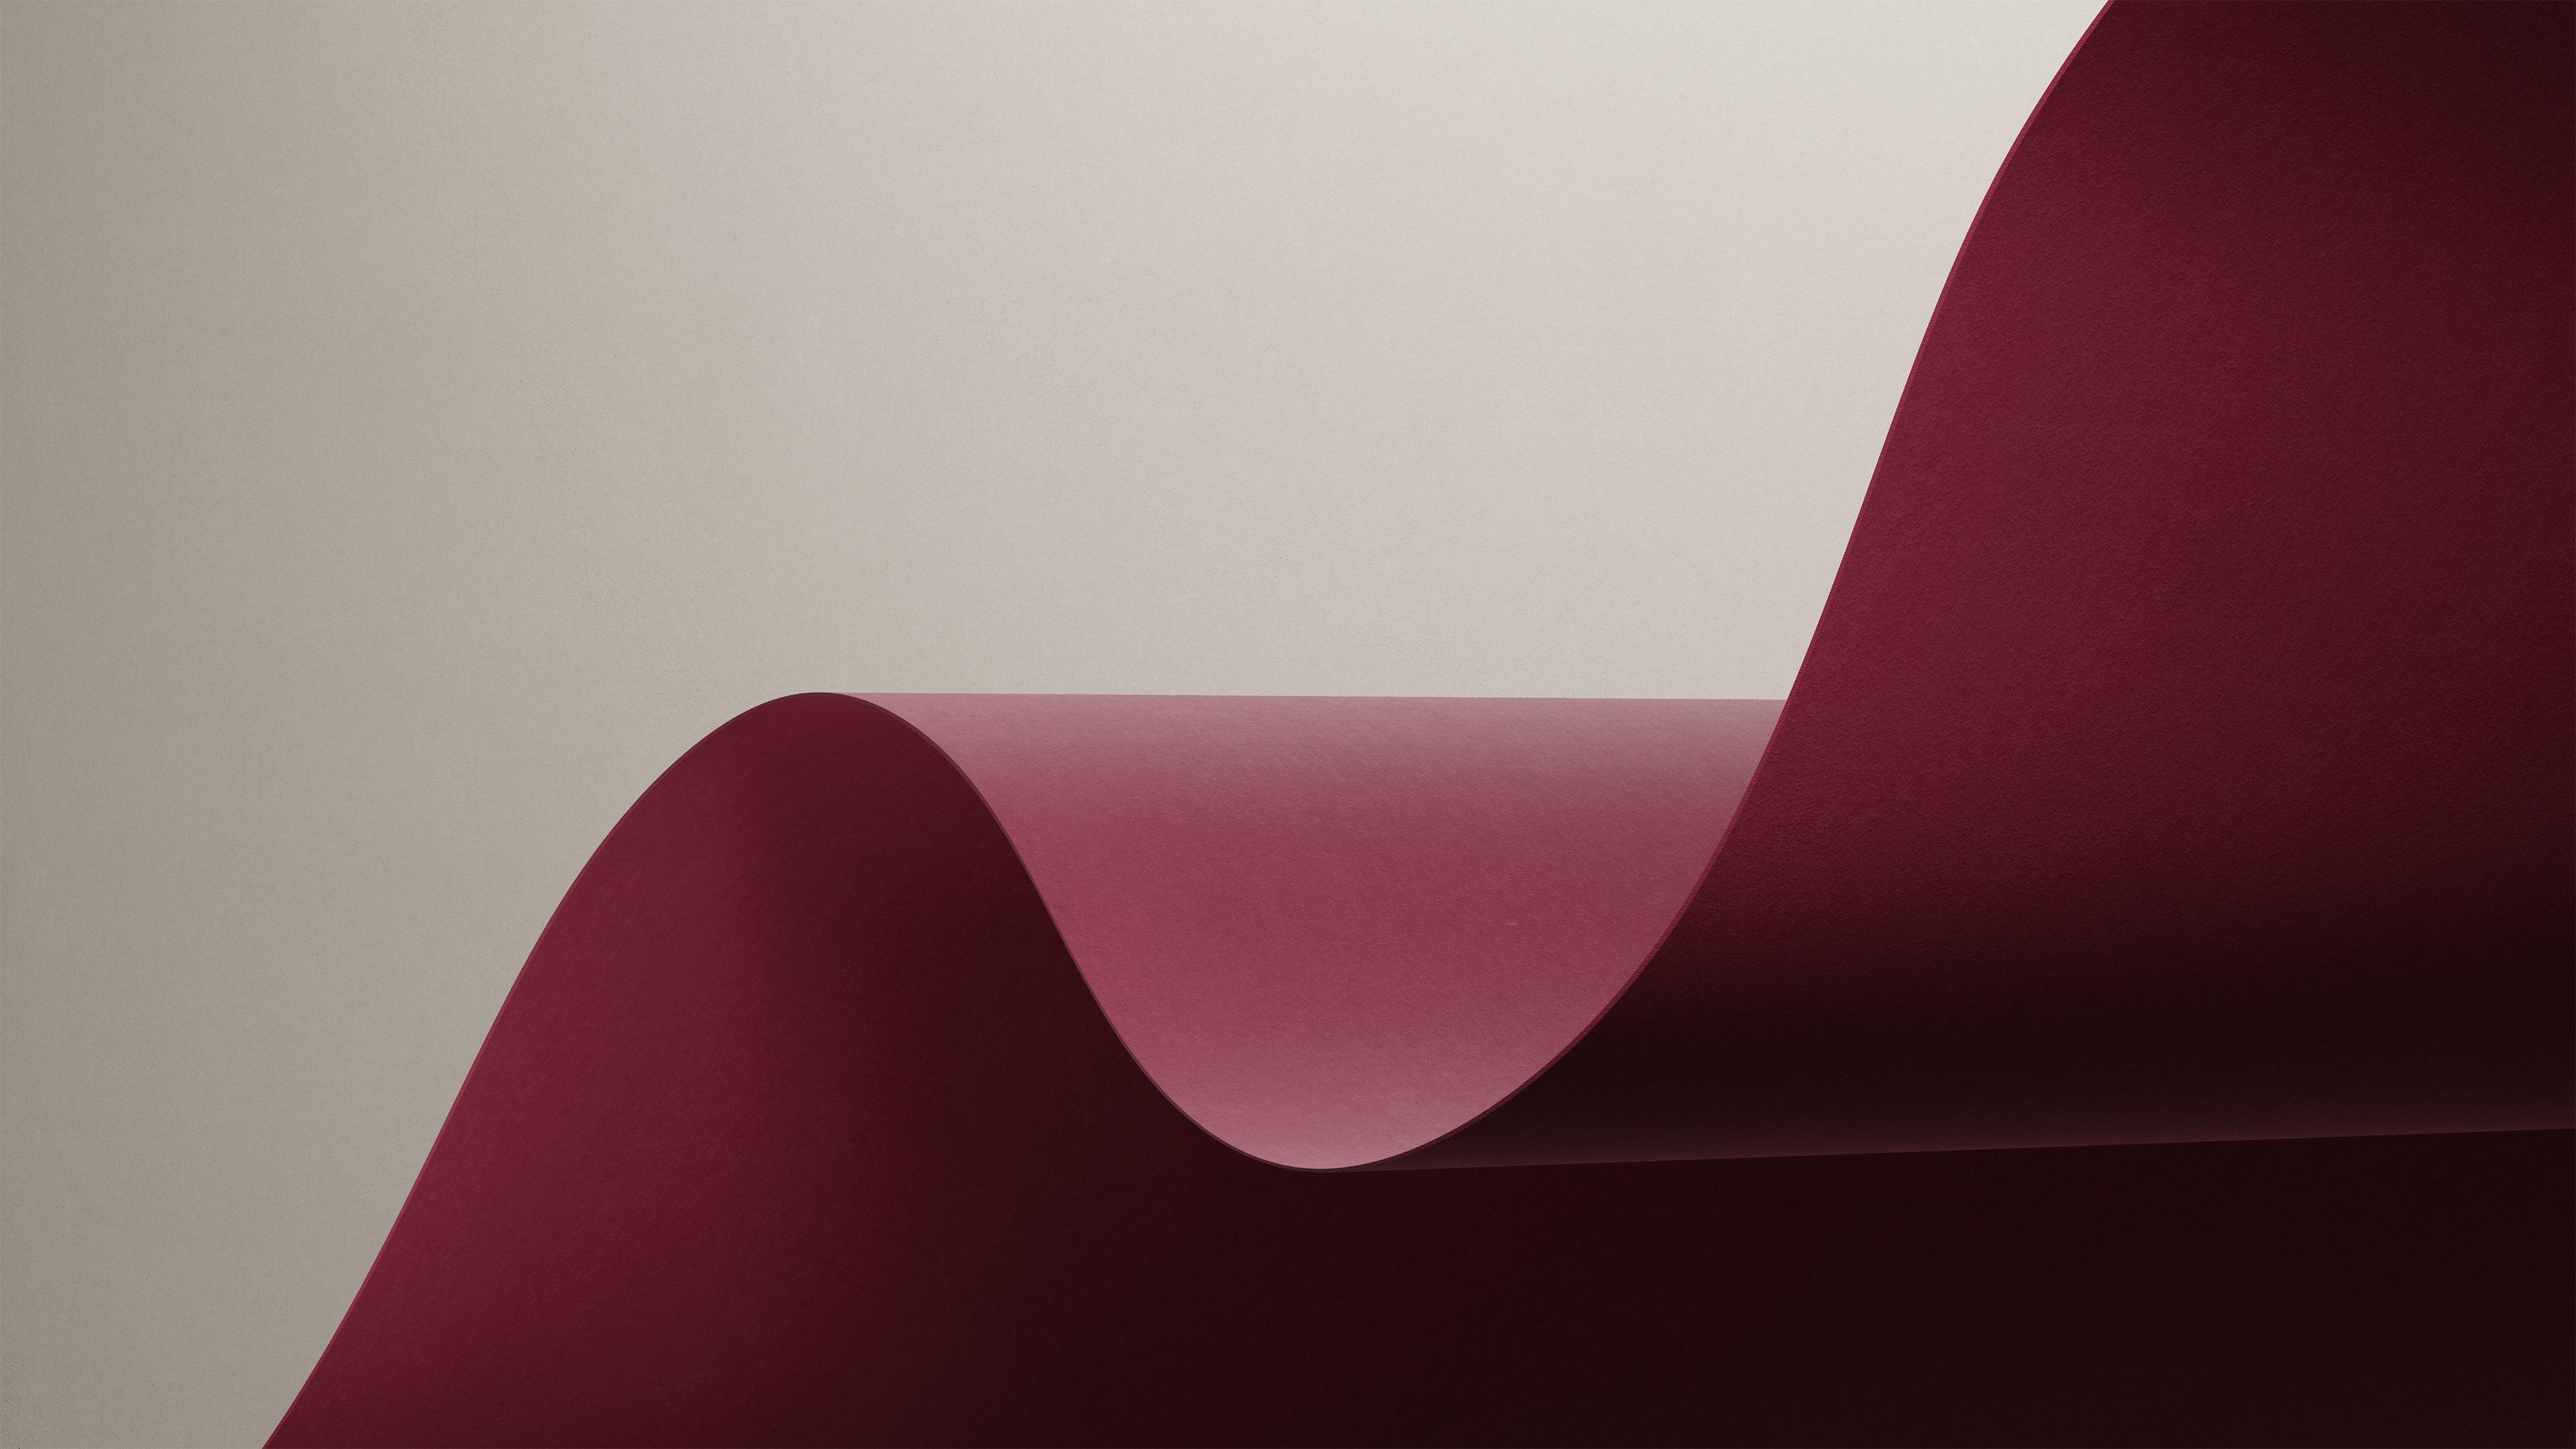 Landscape debrauw paper burgundy duo high res 1